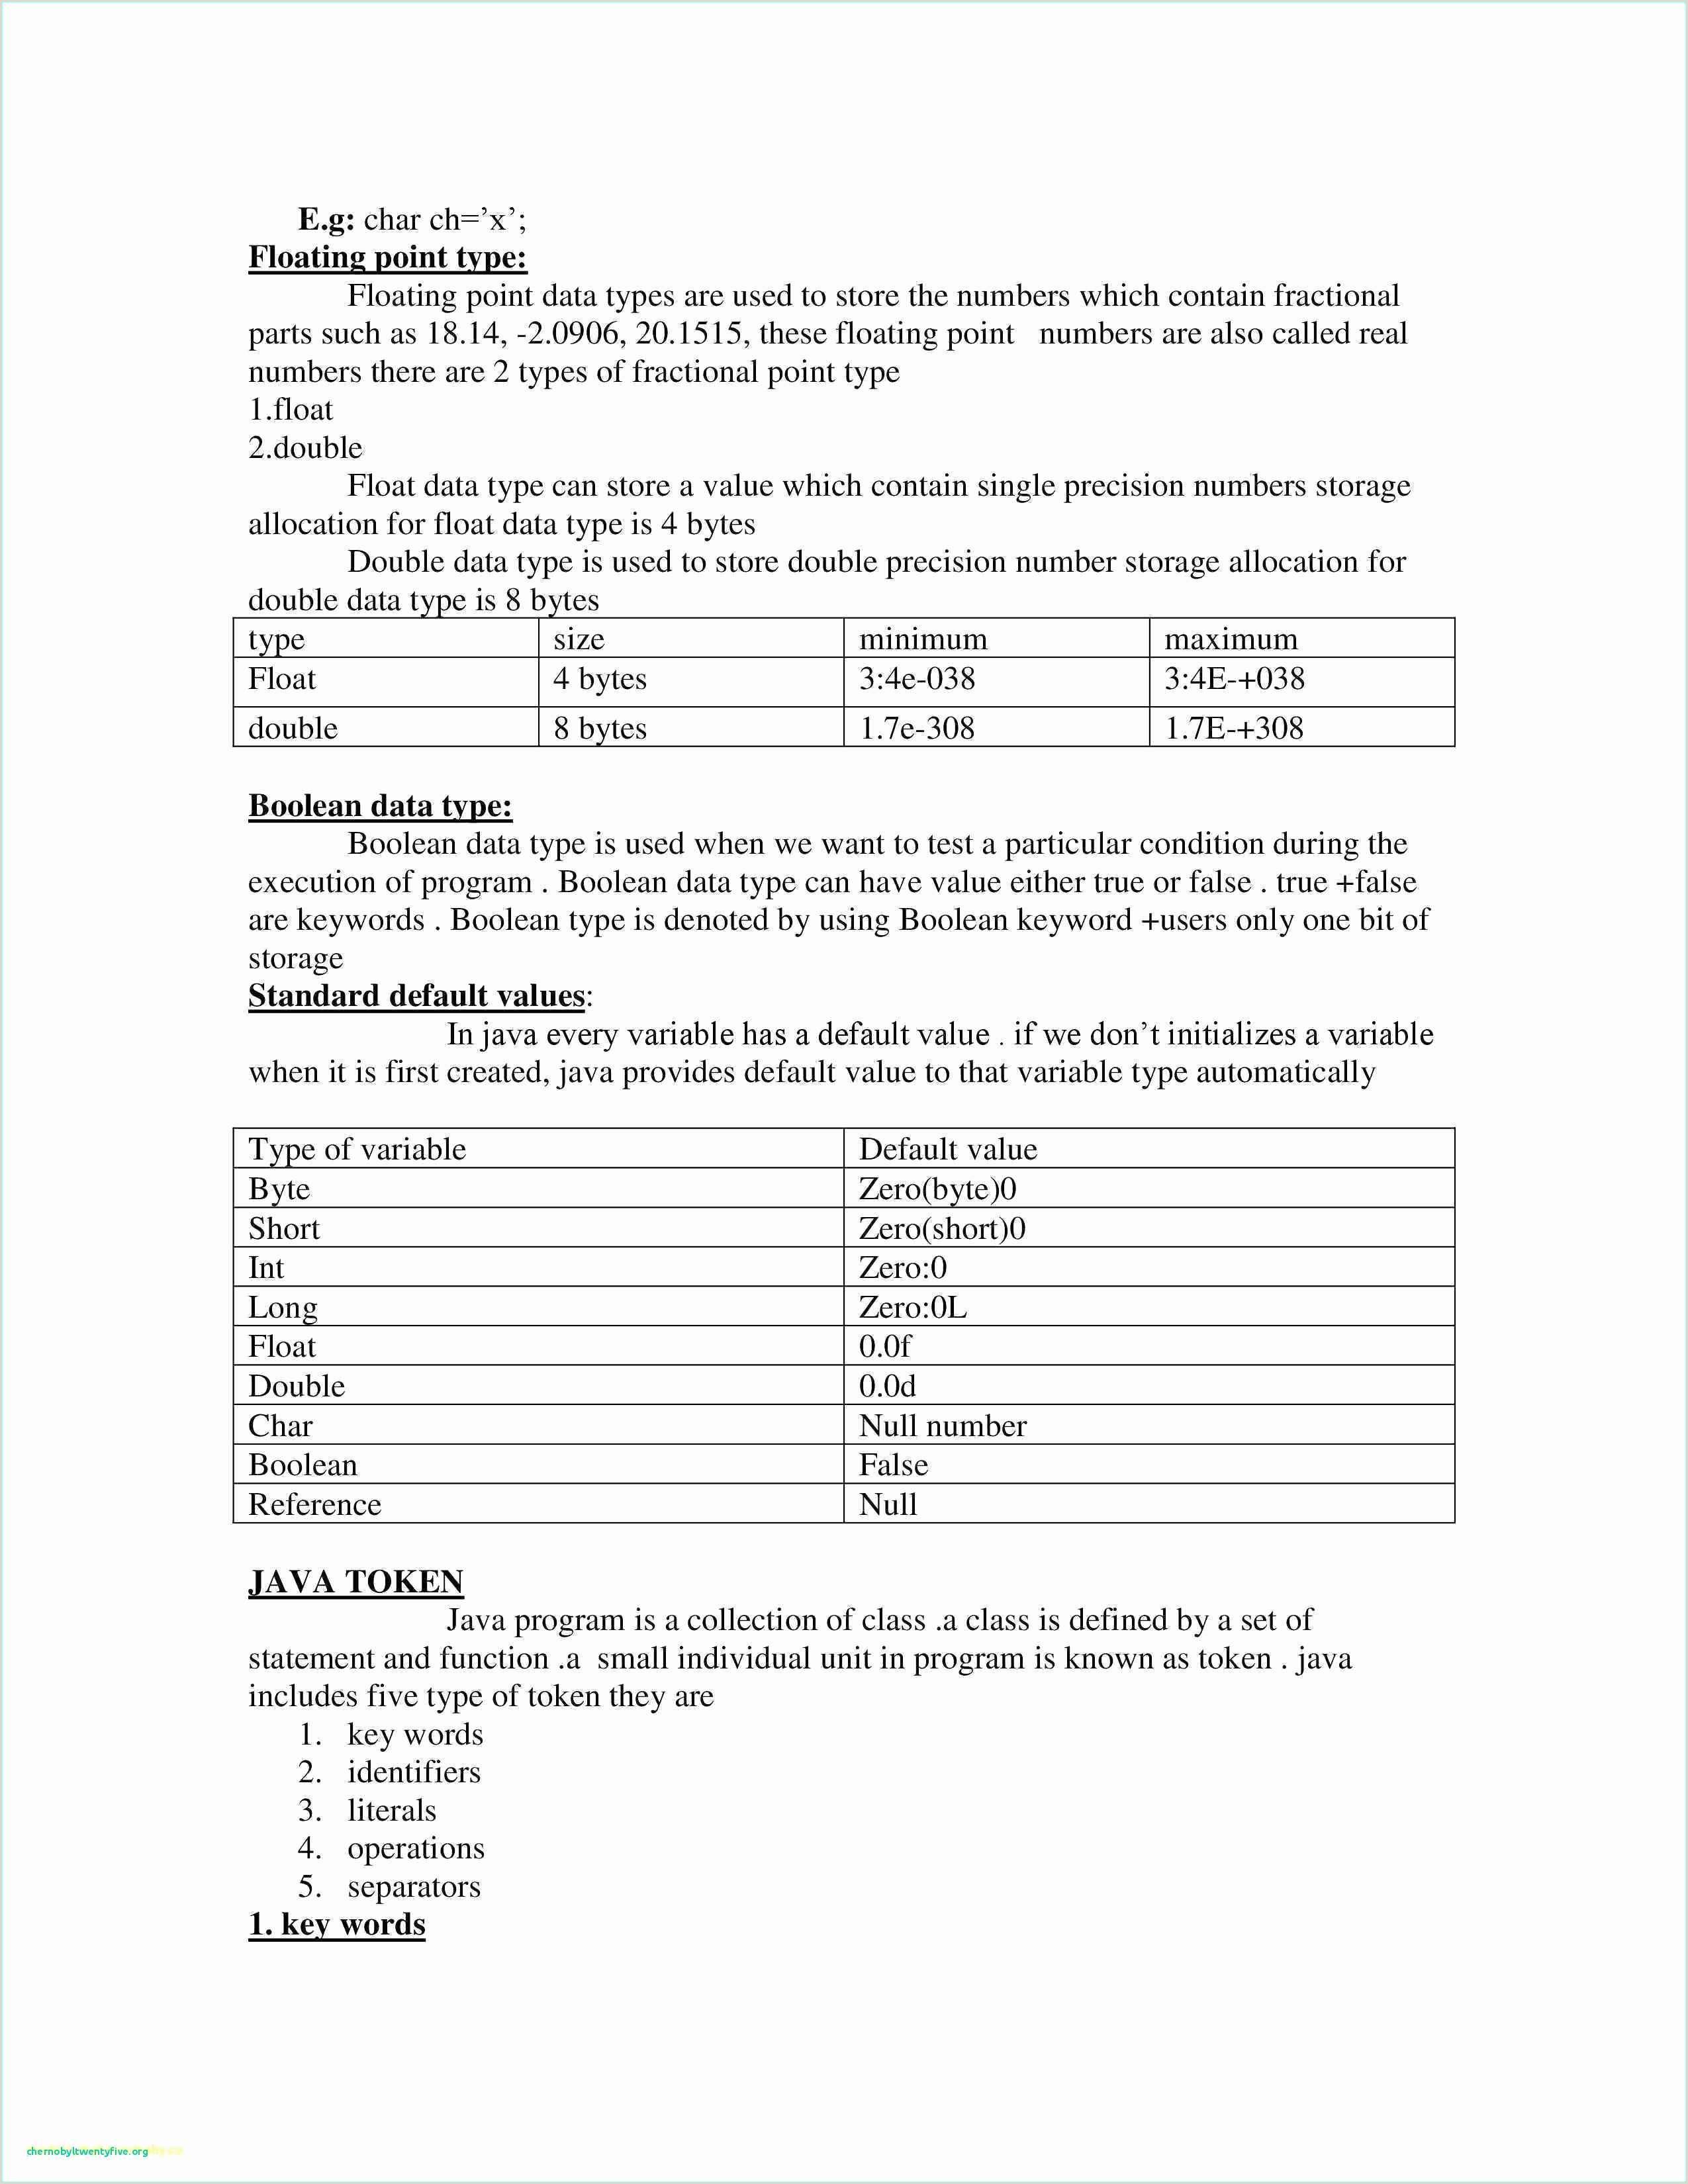 Fresher Resume Format For Software Developers Resume Formats For Fresher New Resume Freshers Format Sample